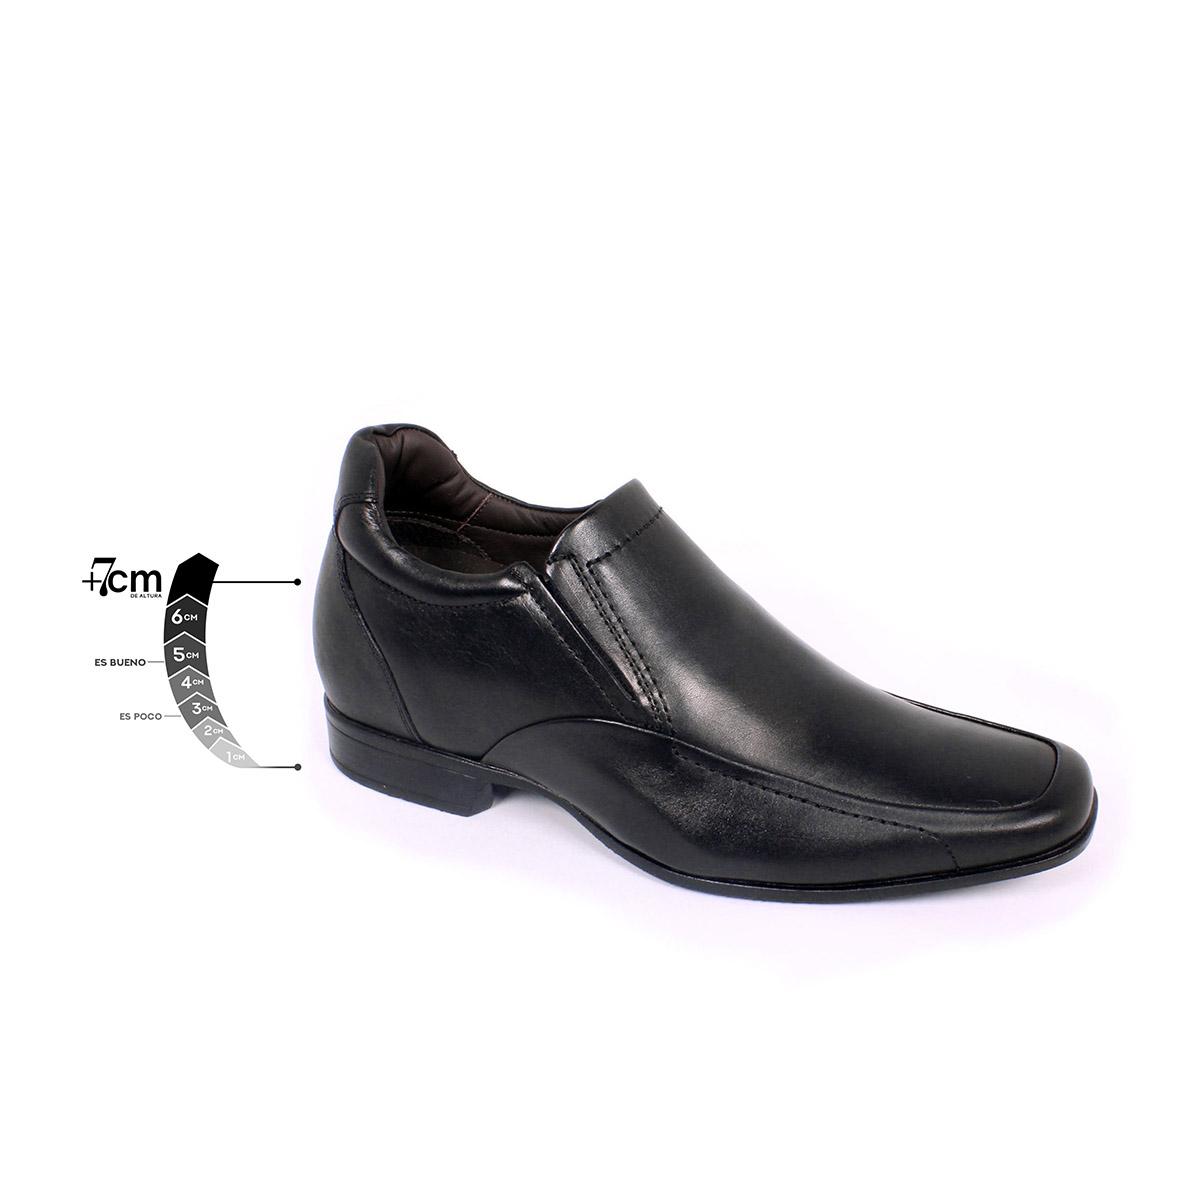 Zapato Formal Tabaco Negro Max Denegri +7cms de Altura_75323